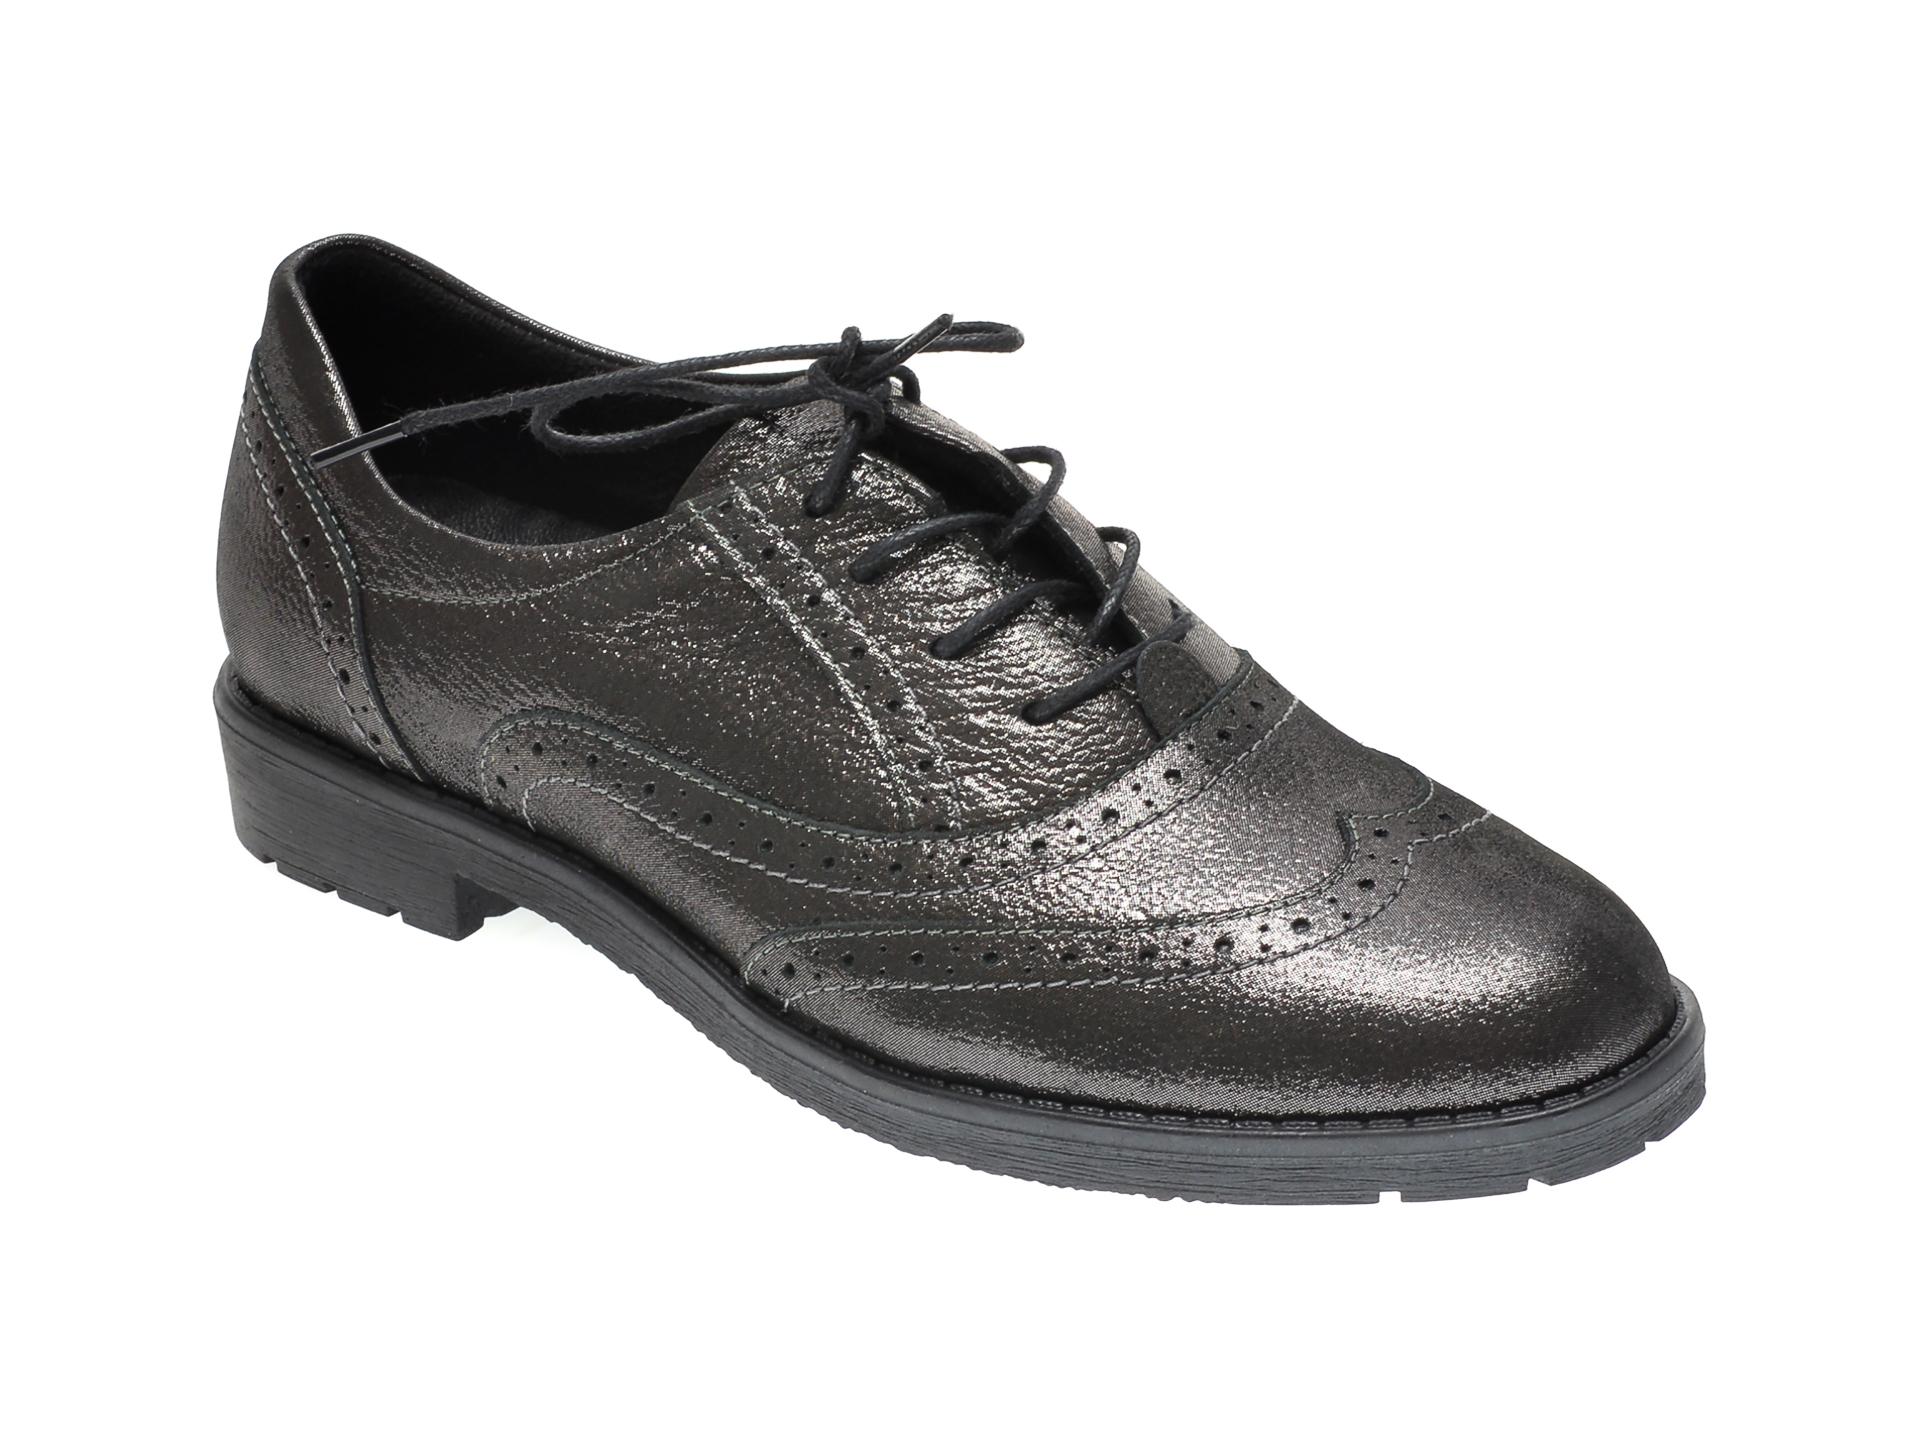 Pantofi ILOZ gri, 1050, din piele naturala